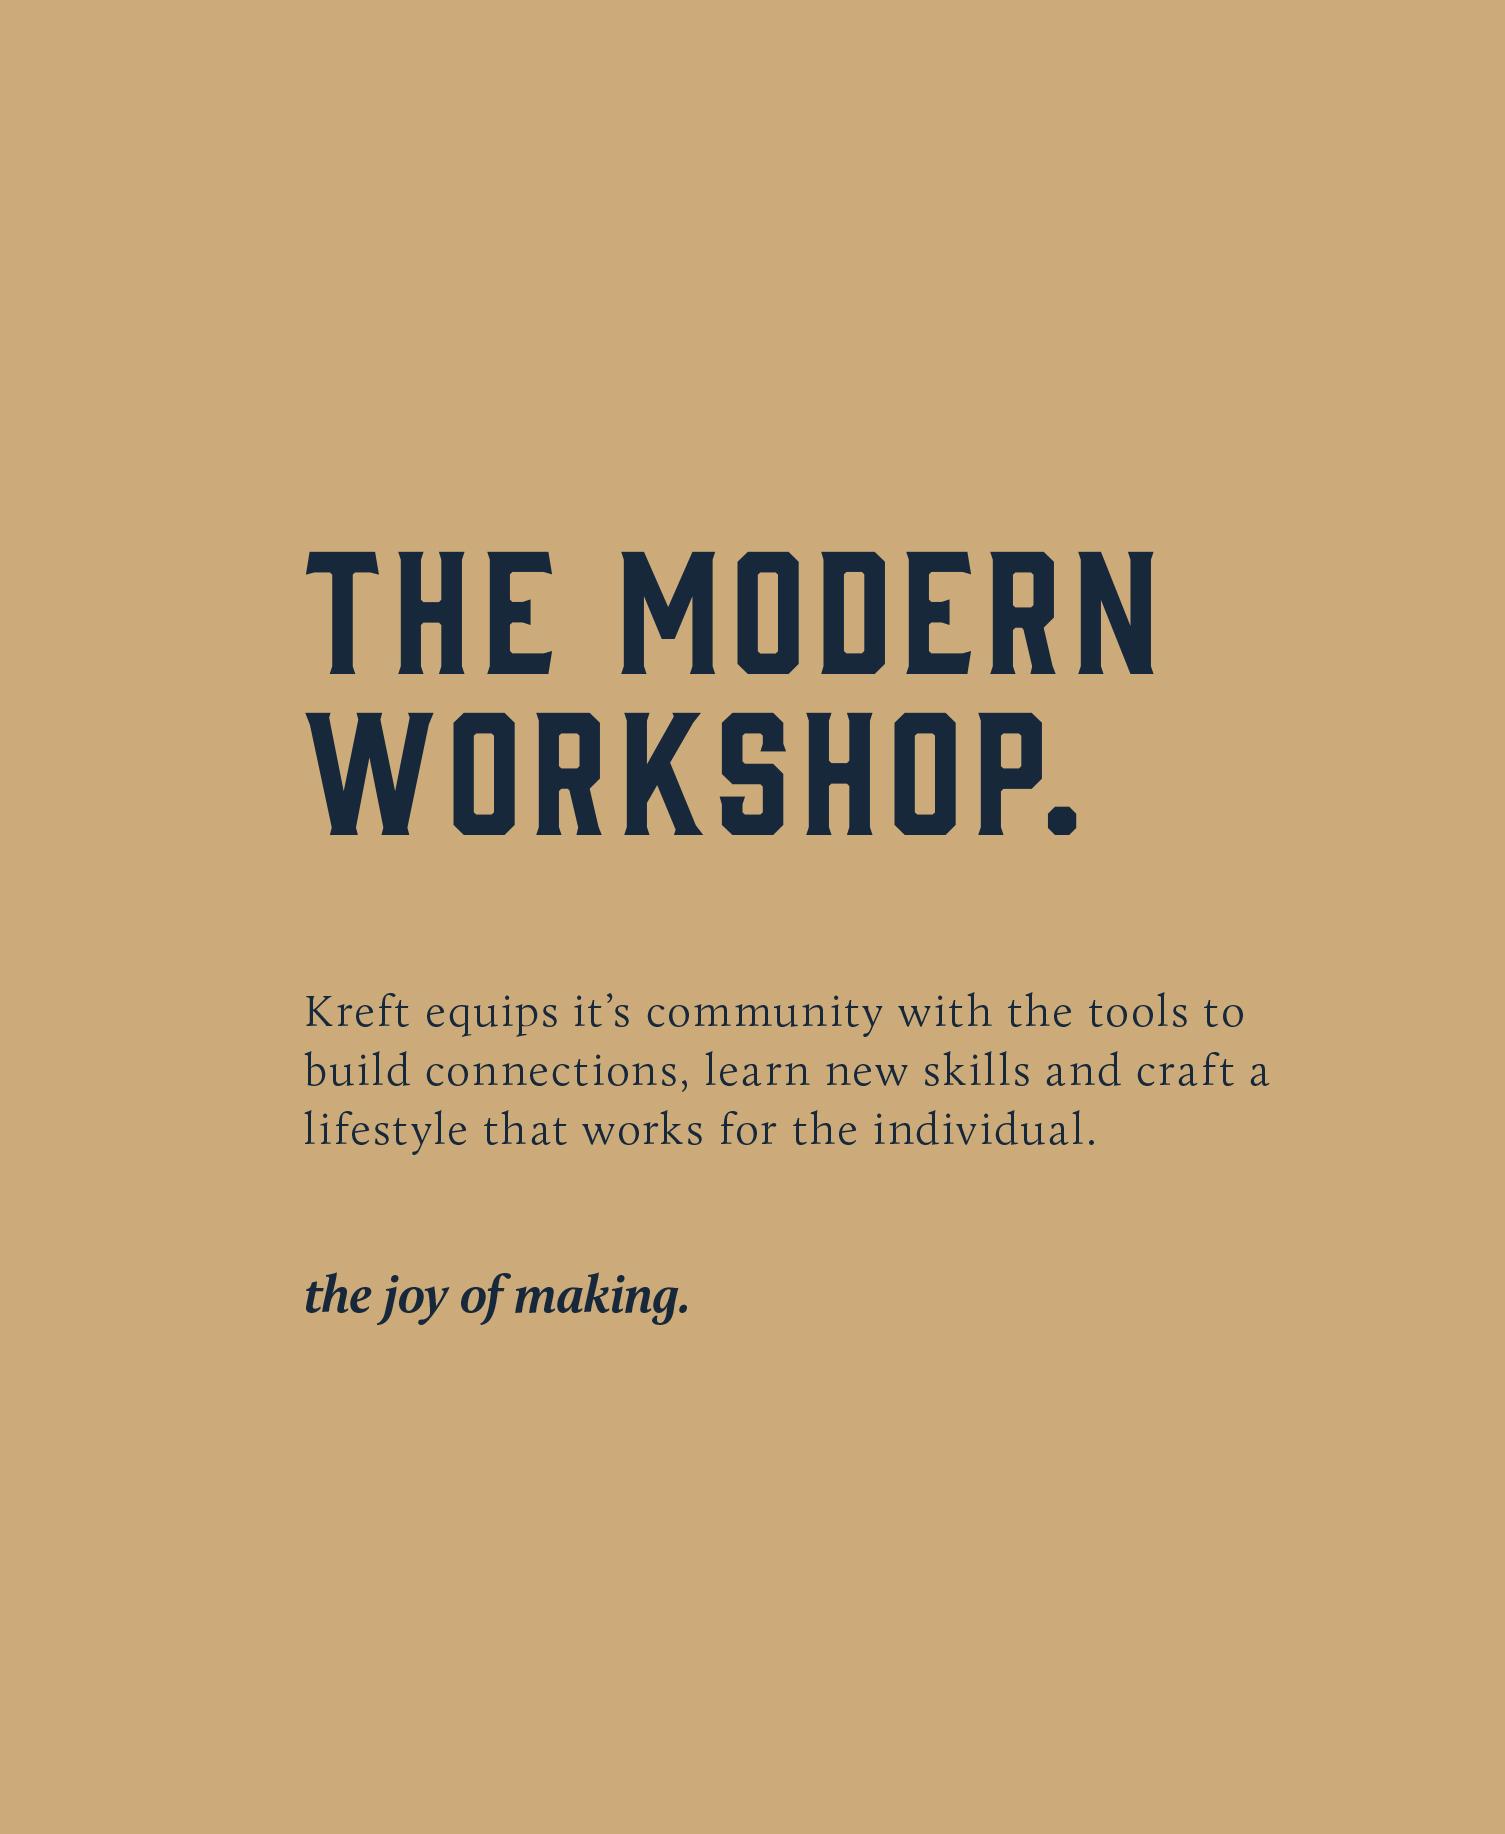 modernworkshop.jpg